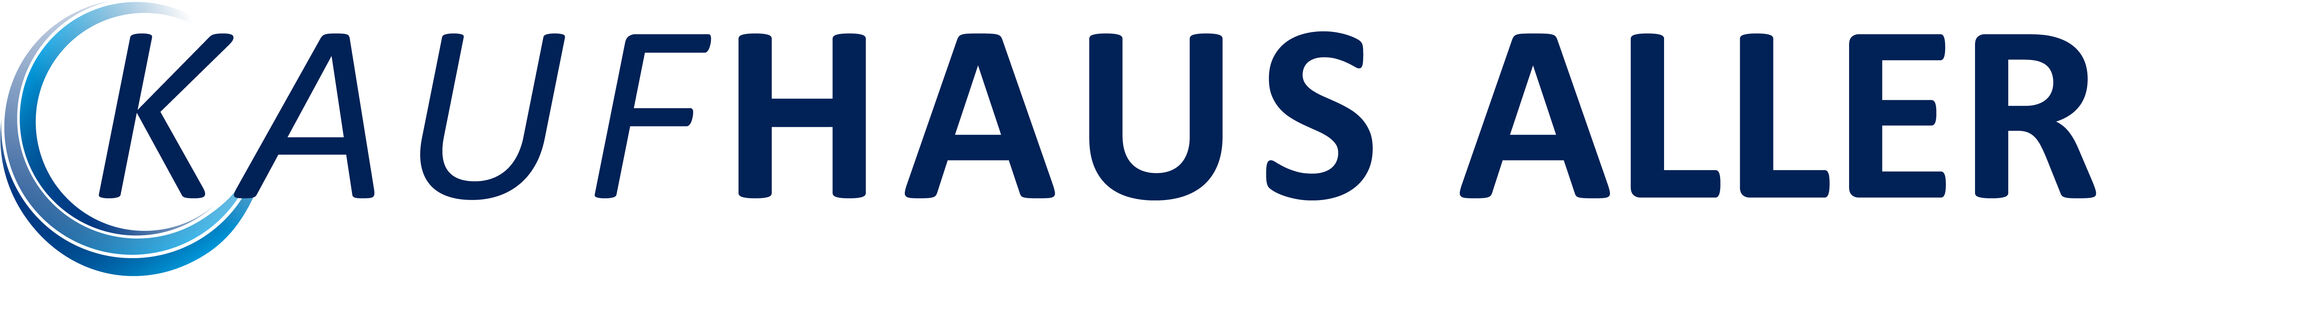 Kaufhaus-Aller-farbig-logo